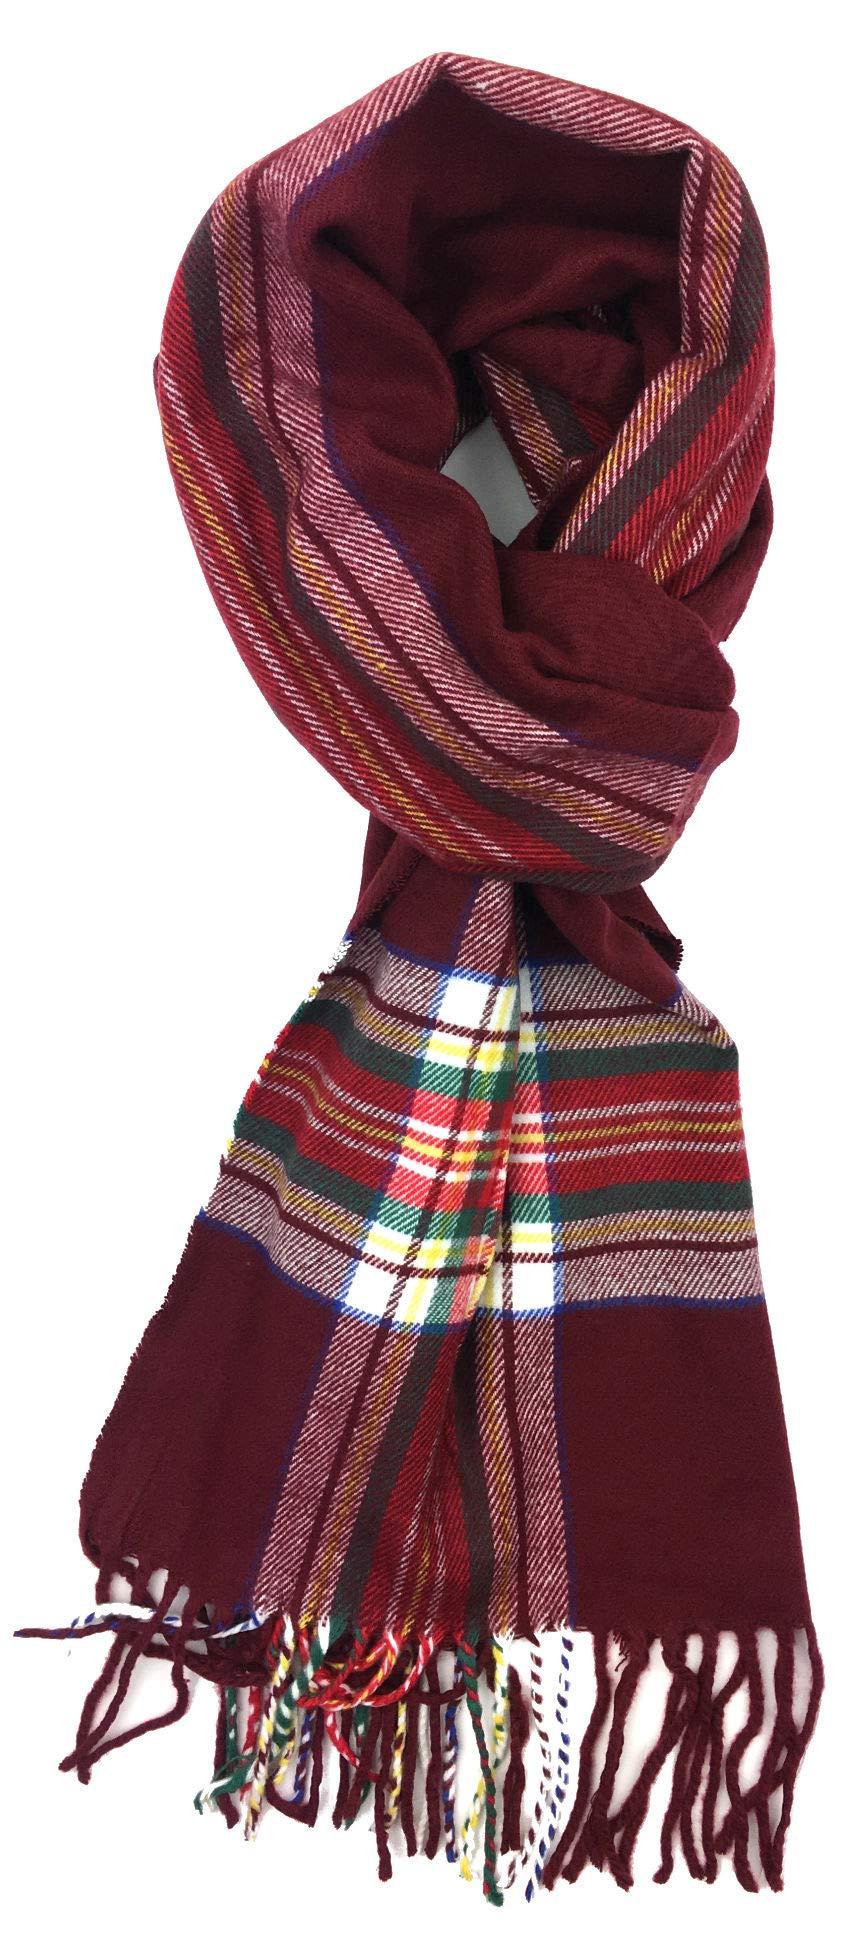 Plum Feathers Super Soft Luxurious Cashmere Feel Winter Scarf (Burgundy Tartan)